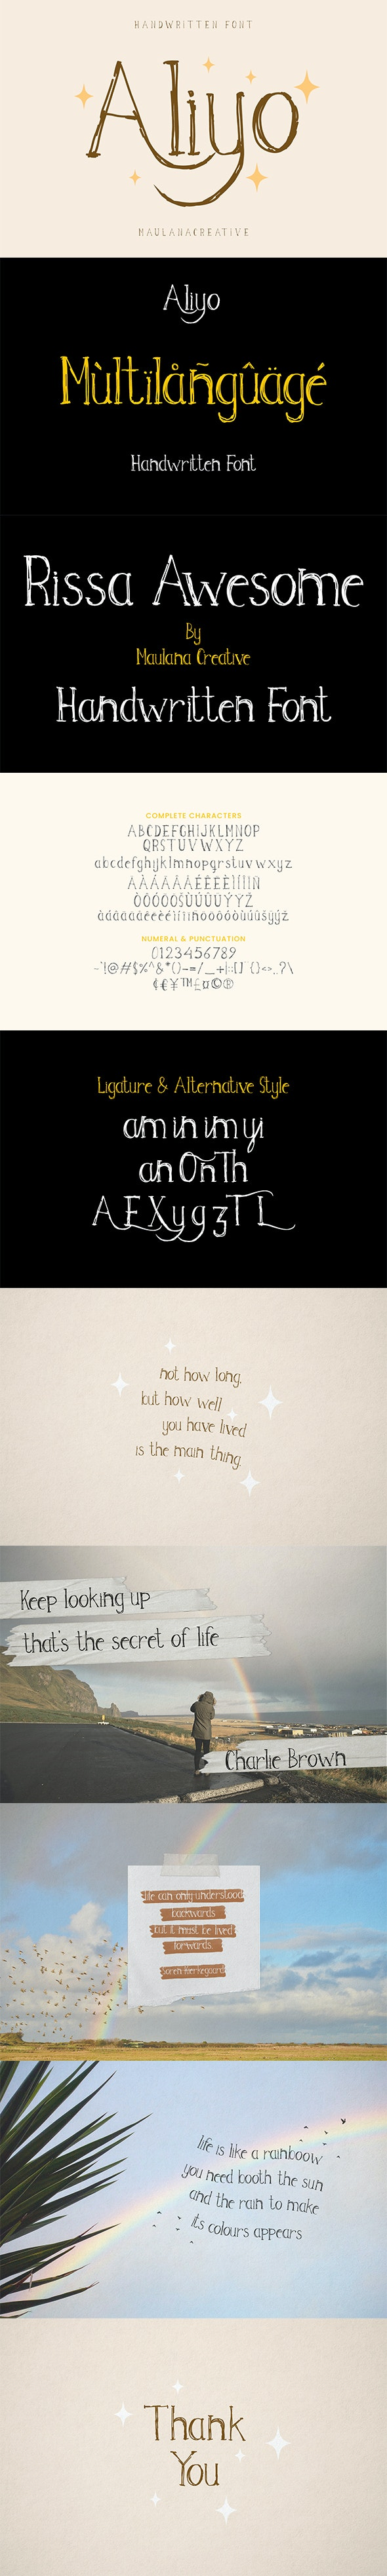 Aliyo Handwritten Font - Sans-Serif Fonts